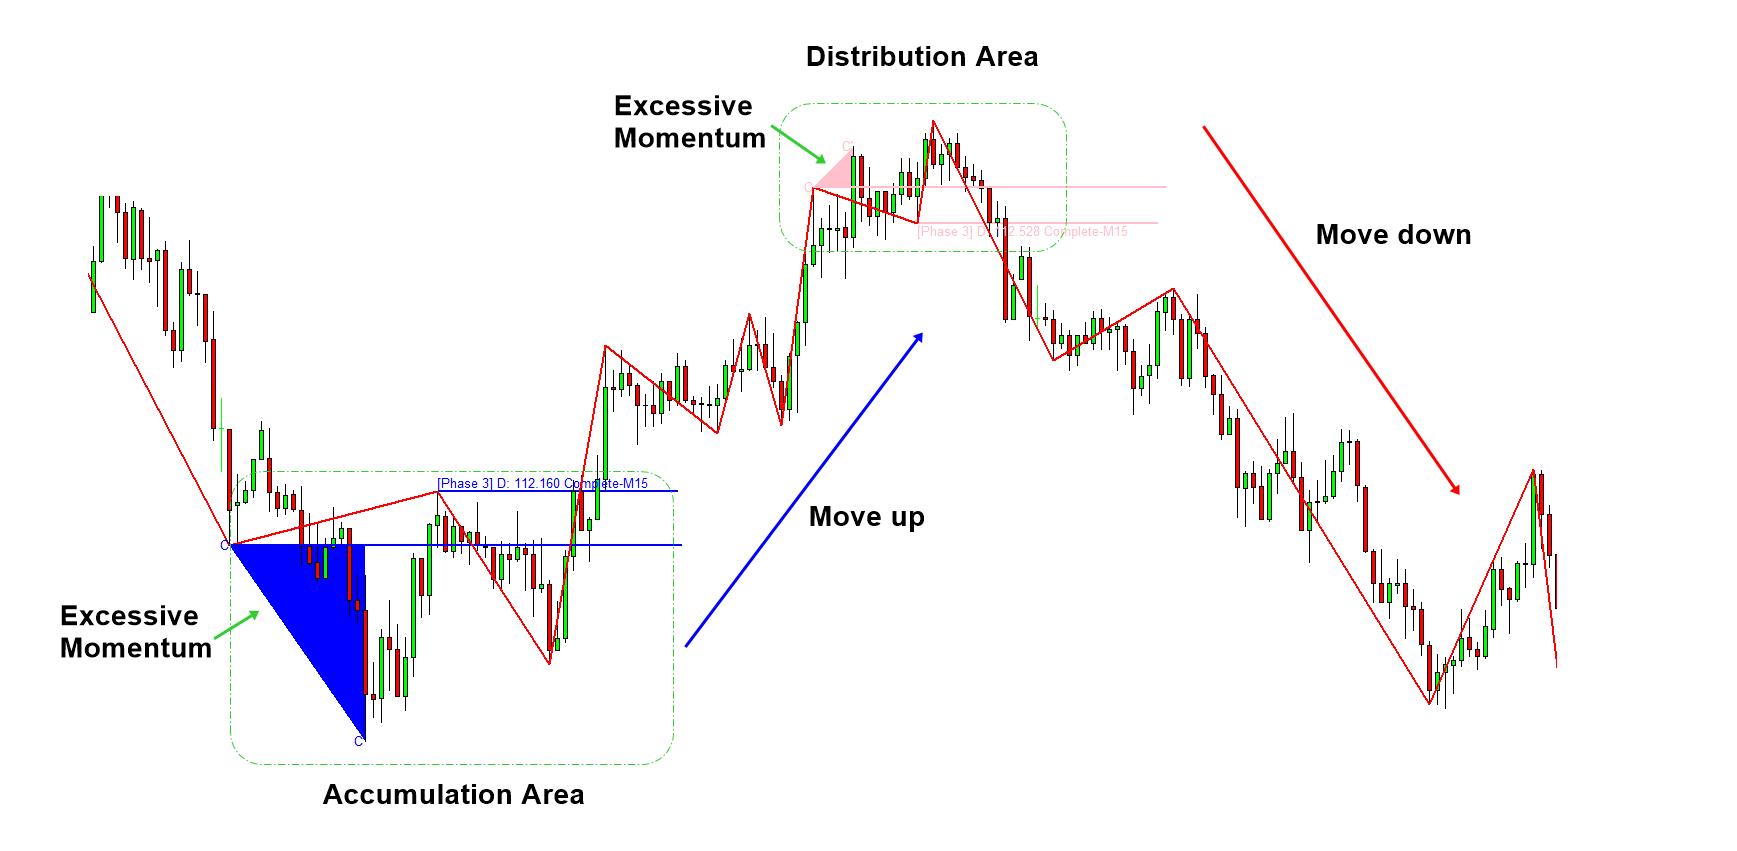 Excessive Momentum with Volume Spread Analysis Figure 8